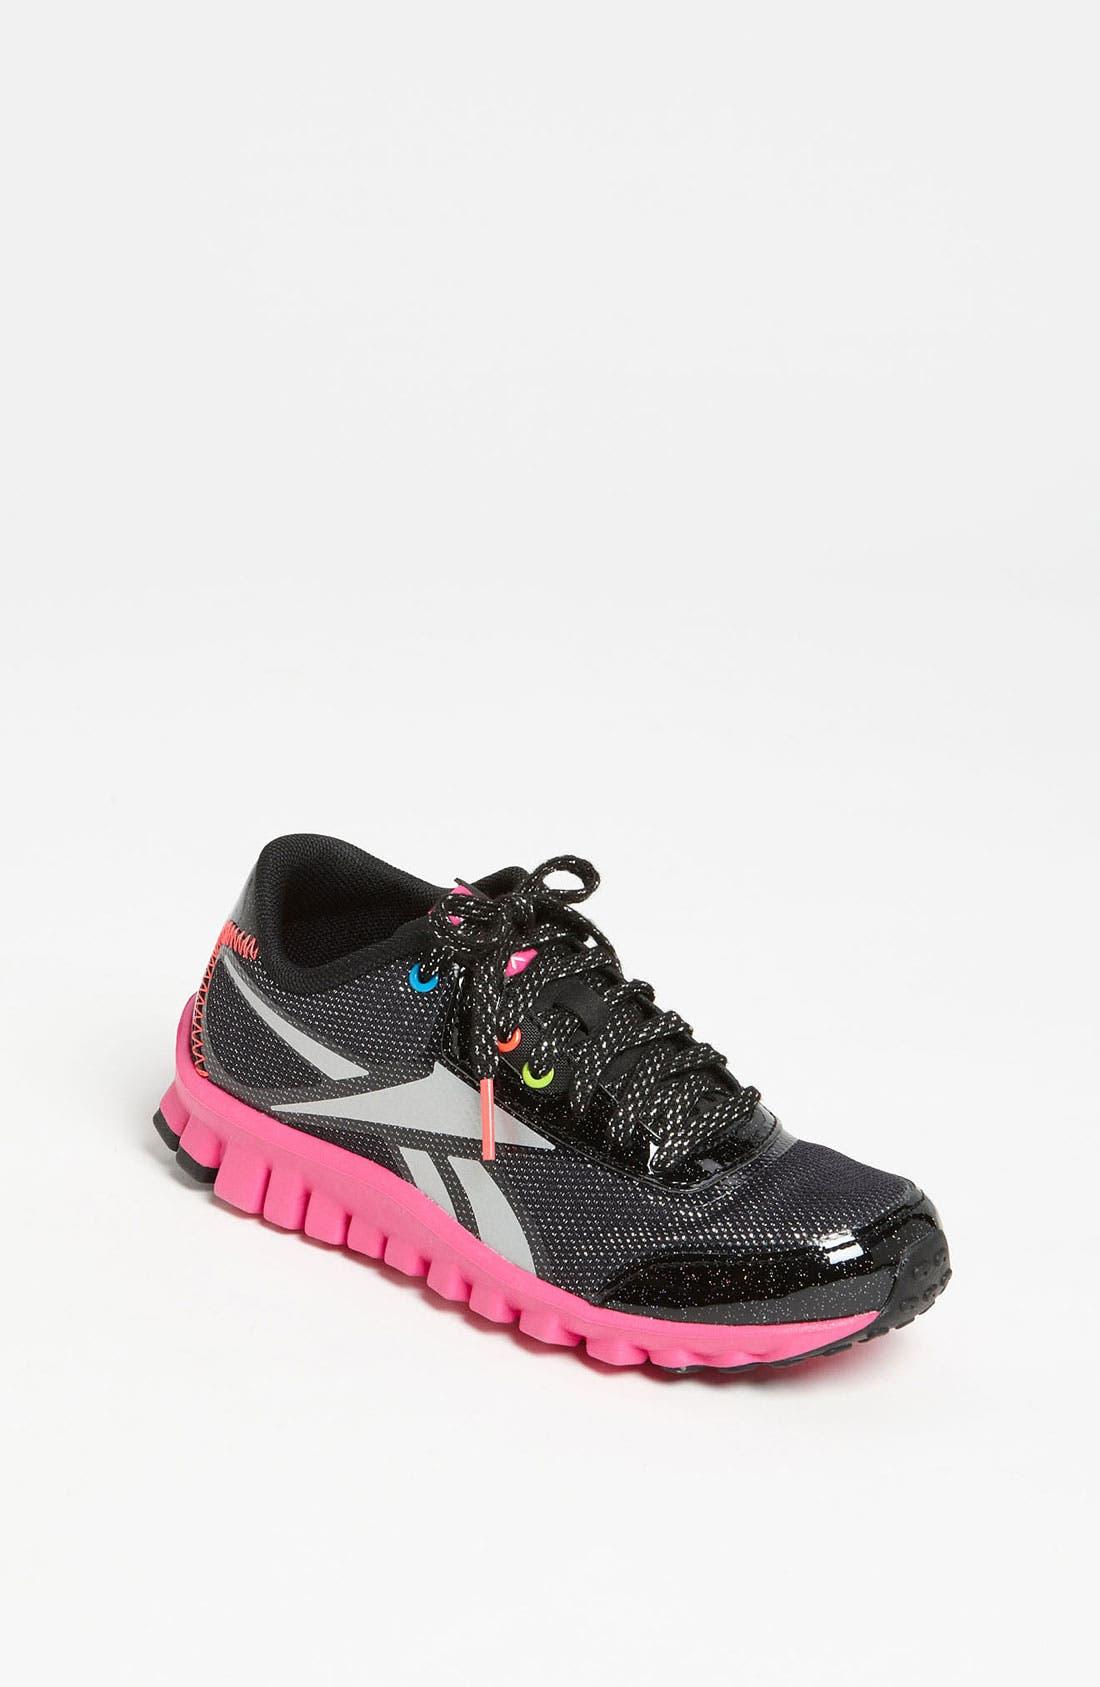 Alternate Image 1 Selected - Reebok 'RealFlex Optimal 3.0' Athletic Shoe (Toddler, Little Kid & Big Kid)